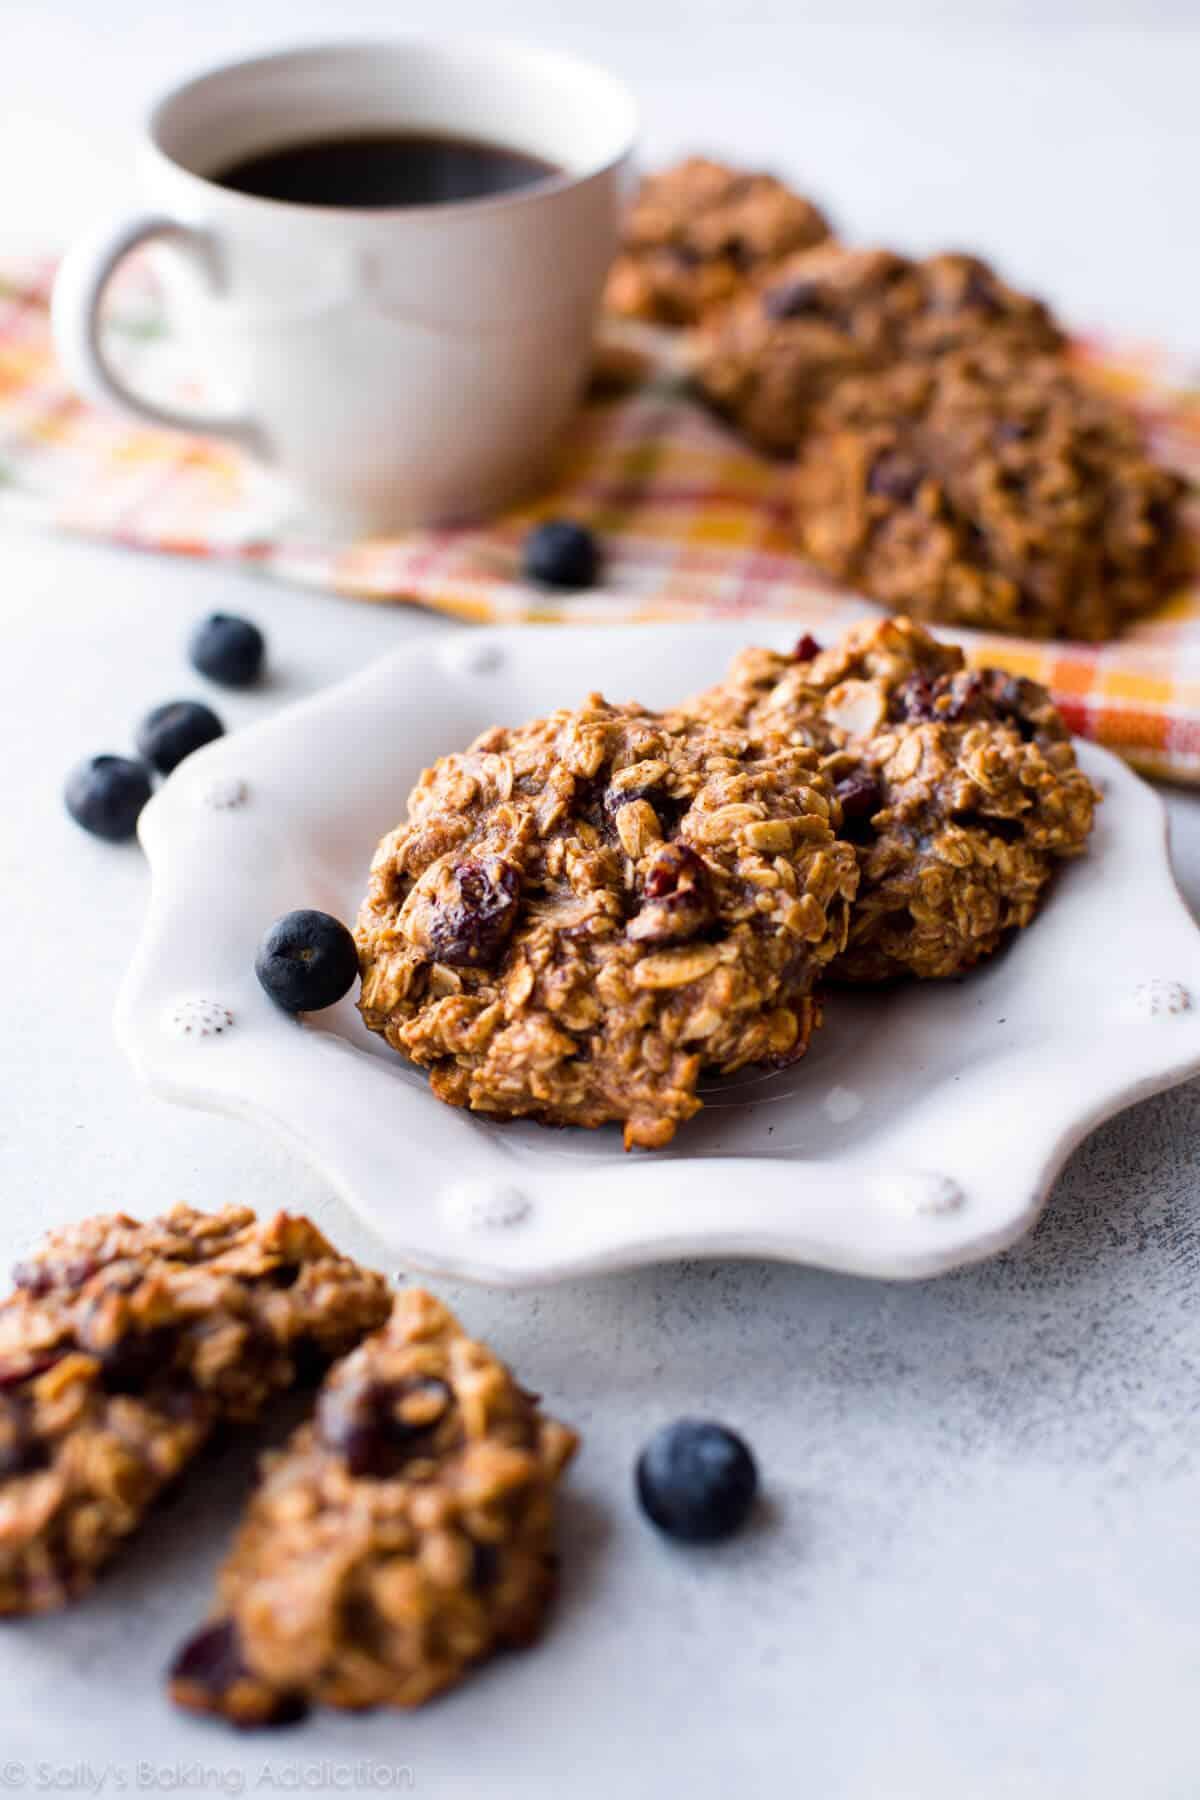 Sally's Cookie Addiction cookbook recipe